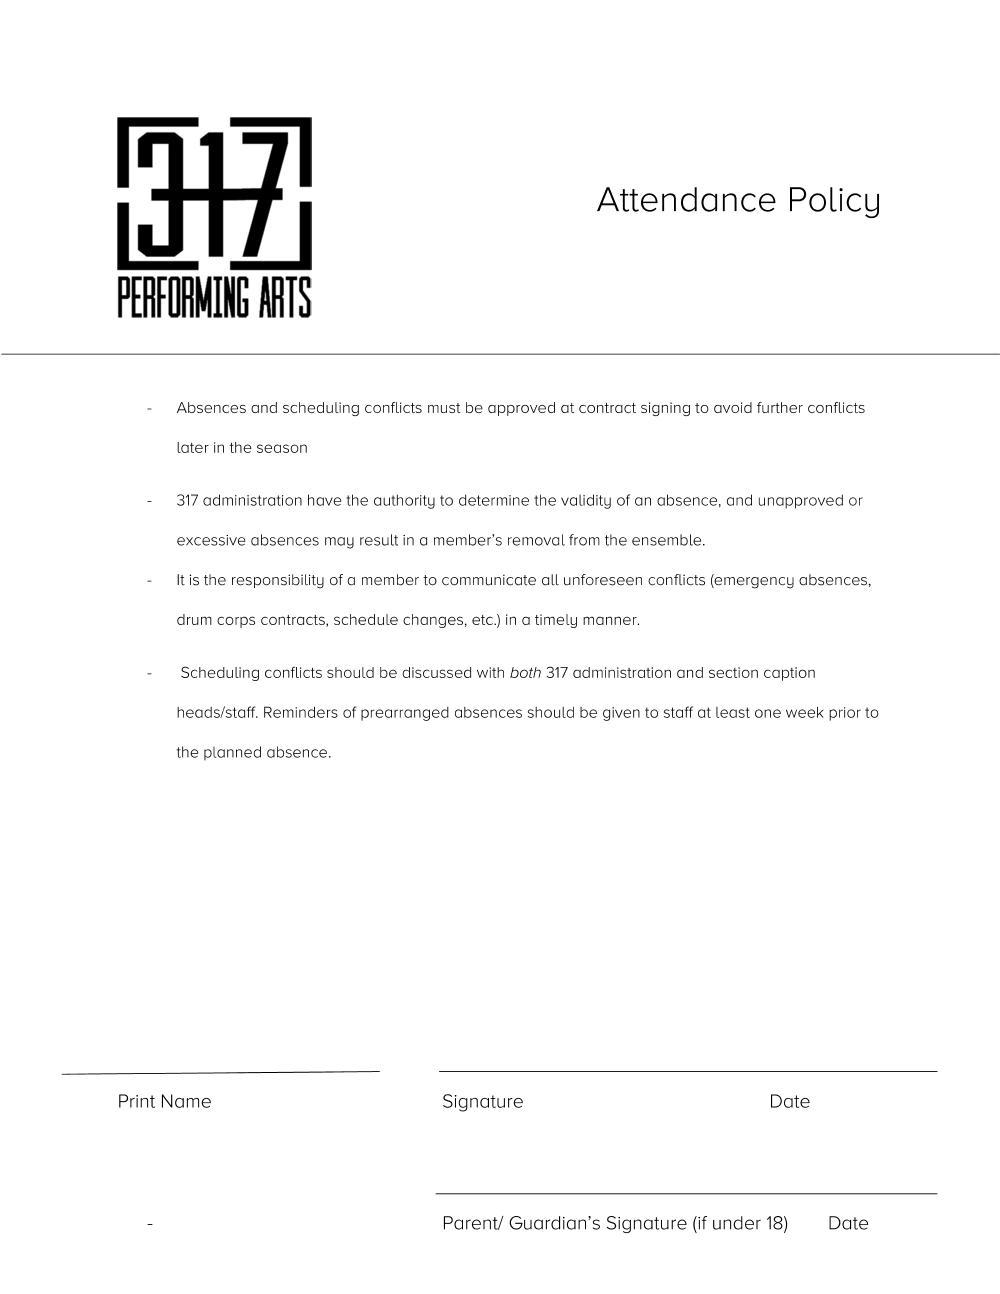 Attendance Policy.jpg